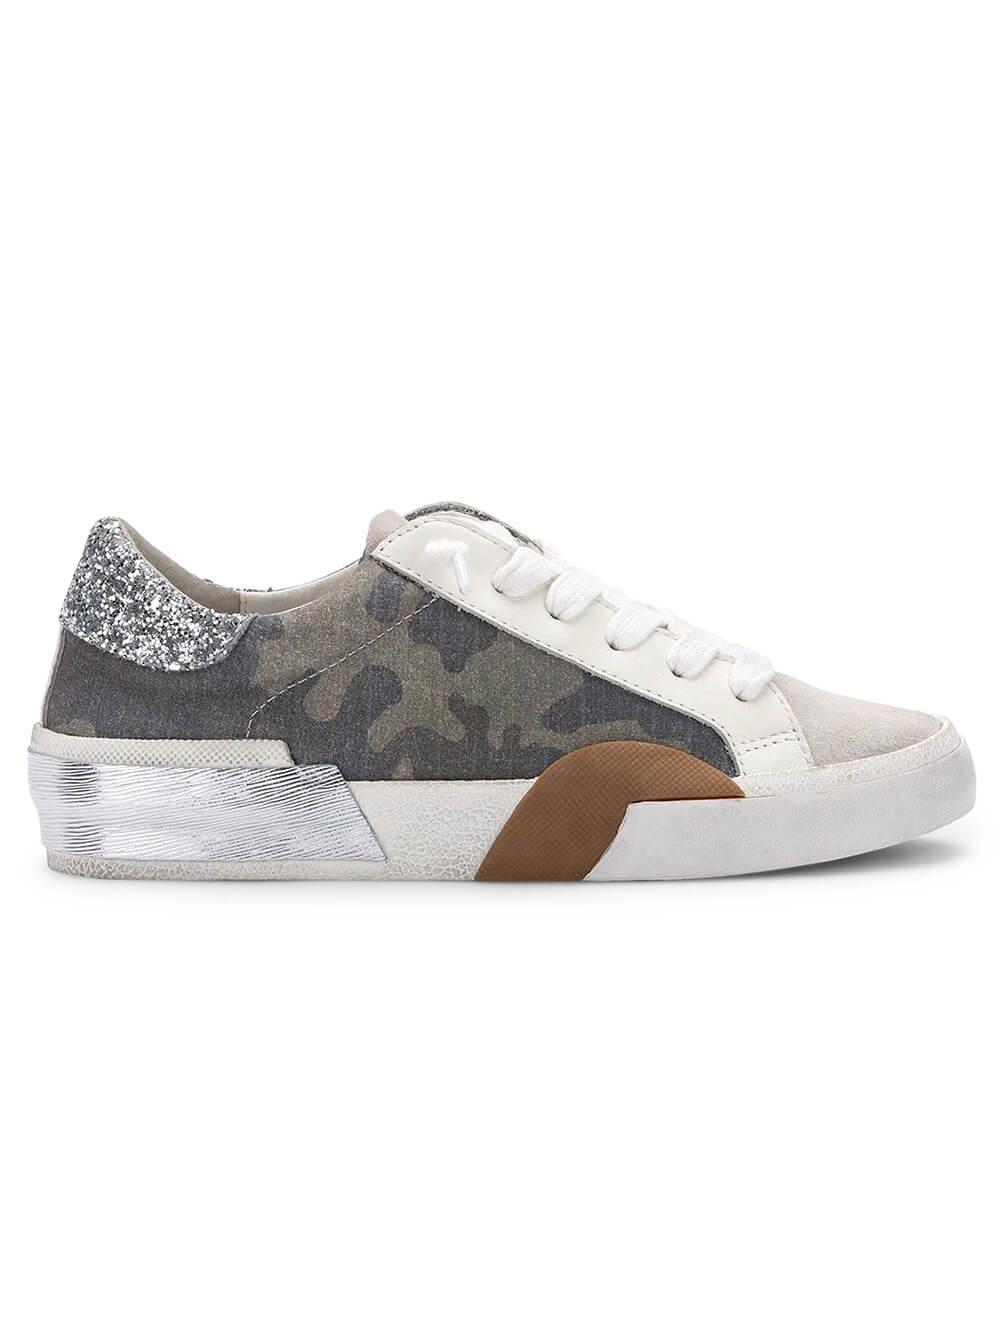 Zina Camo Sneaker Item # ZINA-CAMO